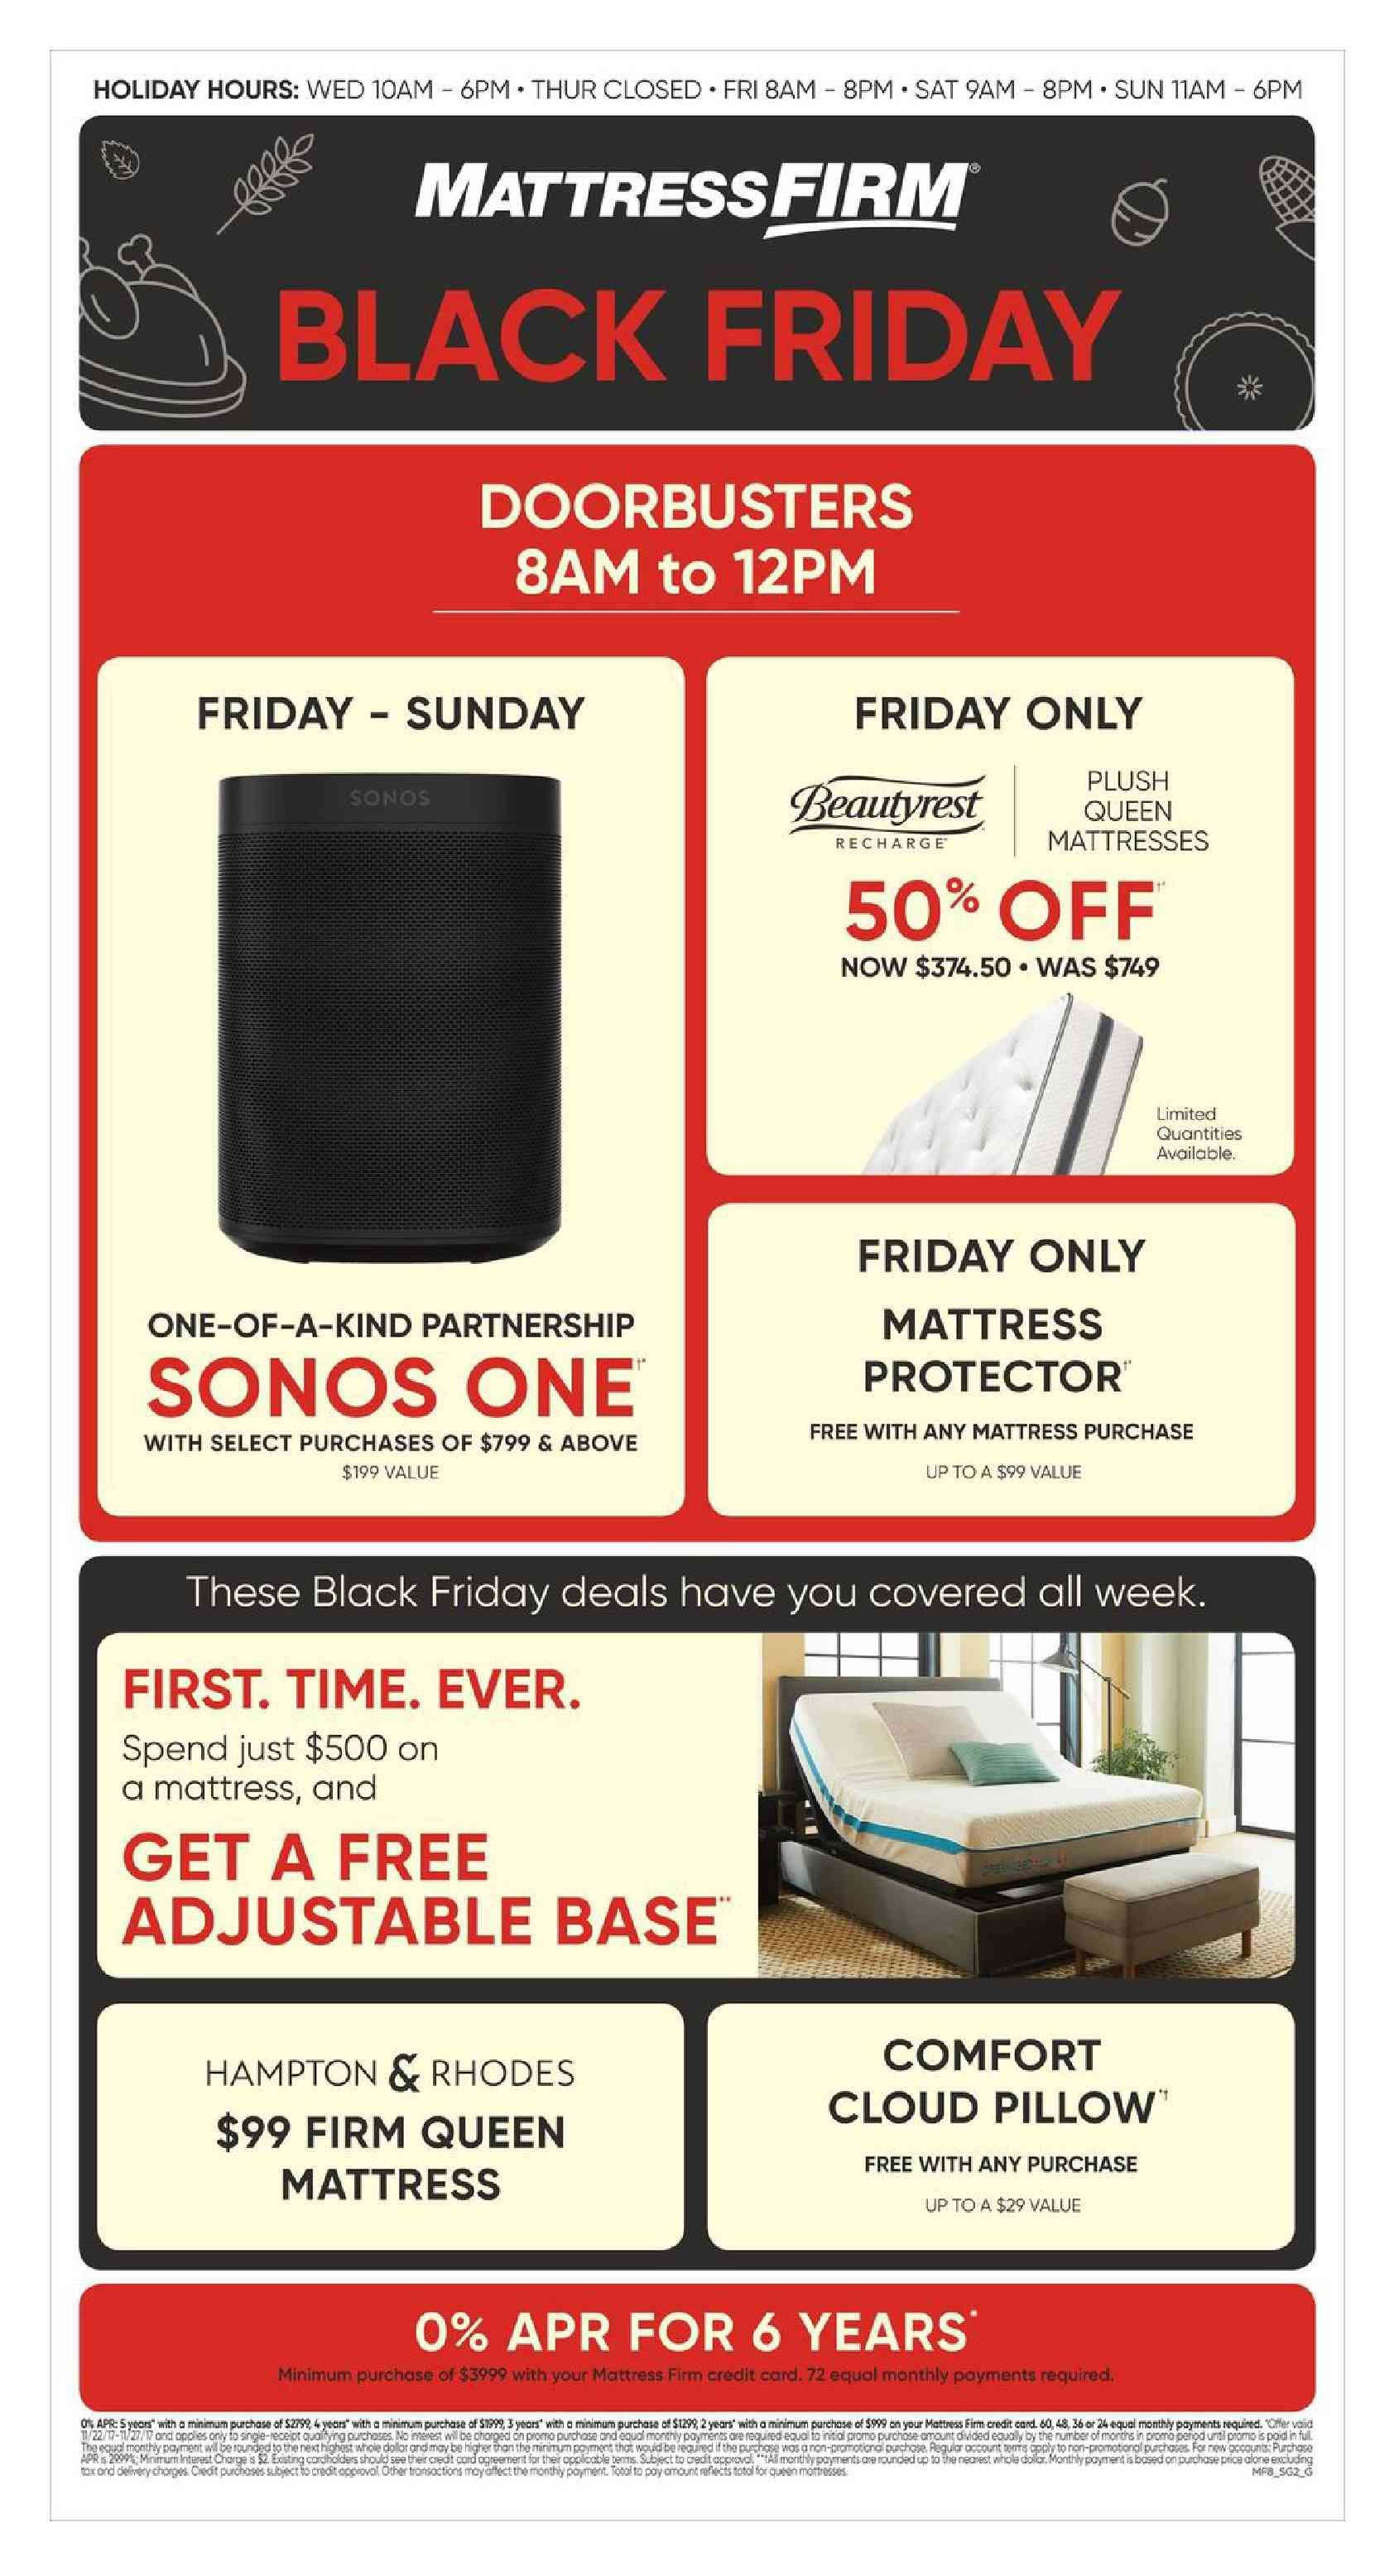 Pin by Jason Ellampally on 《TOP JOB》 | Weekly ads, Black friday